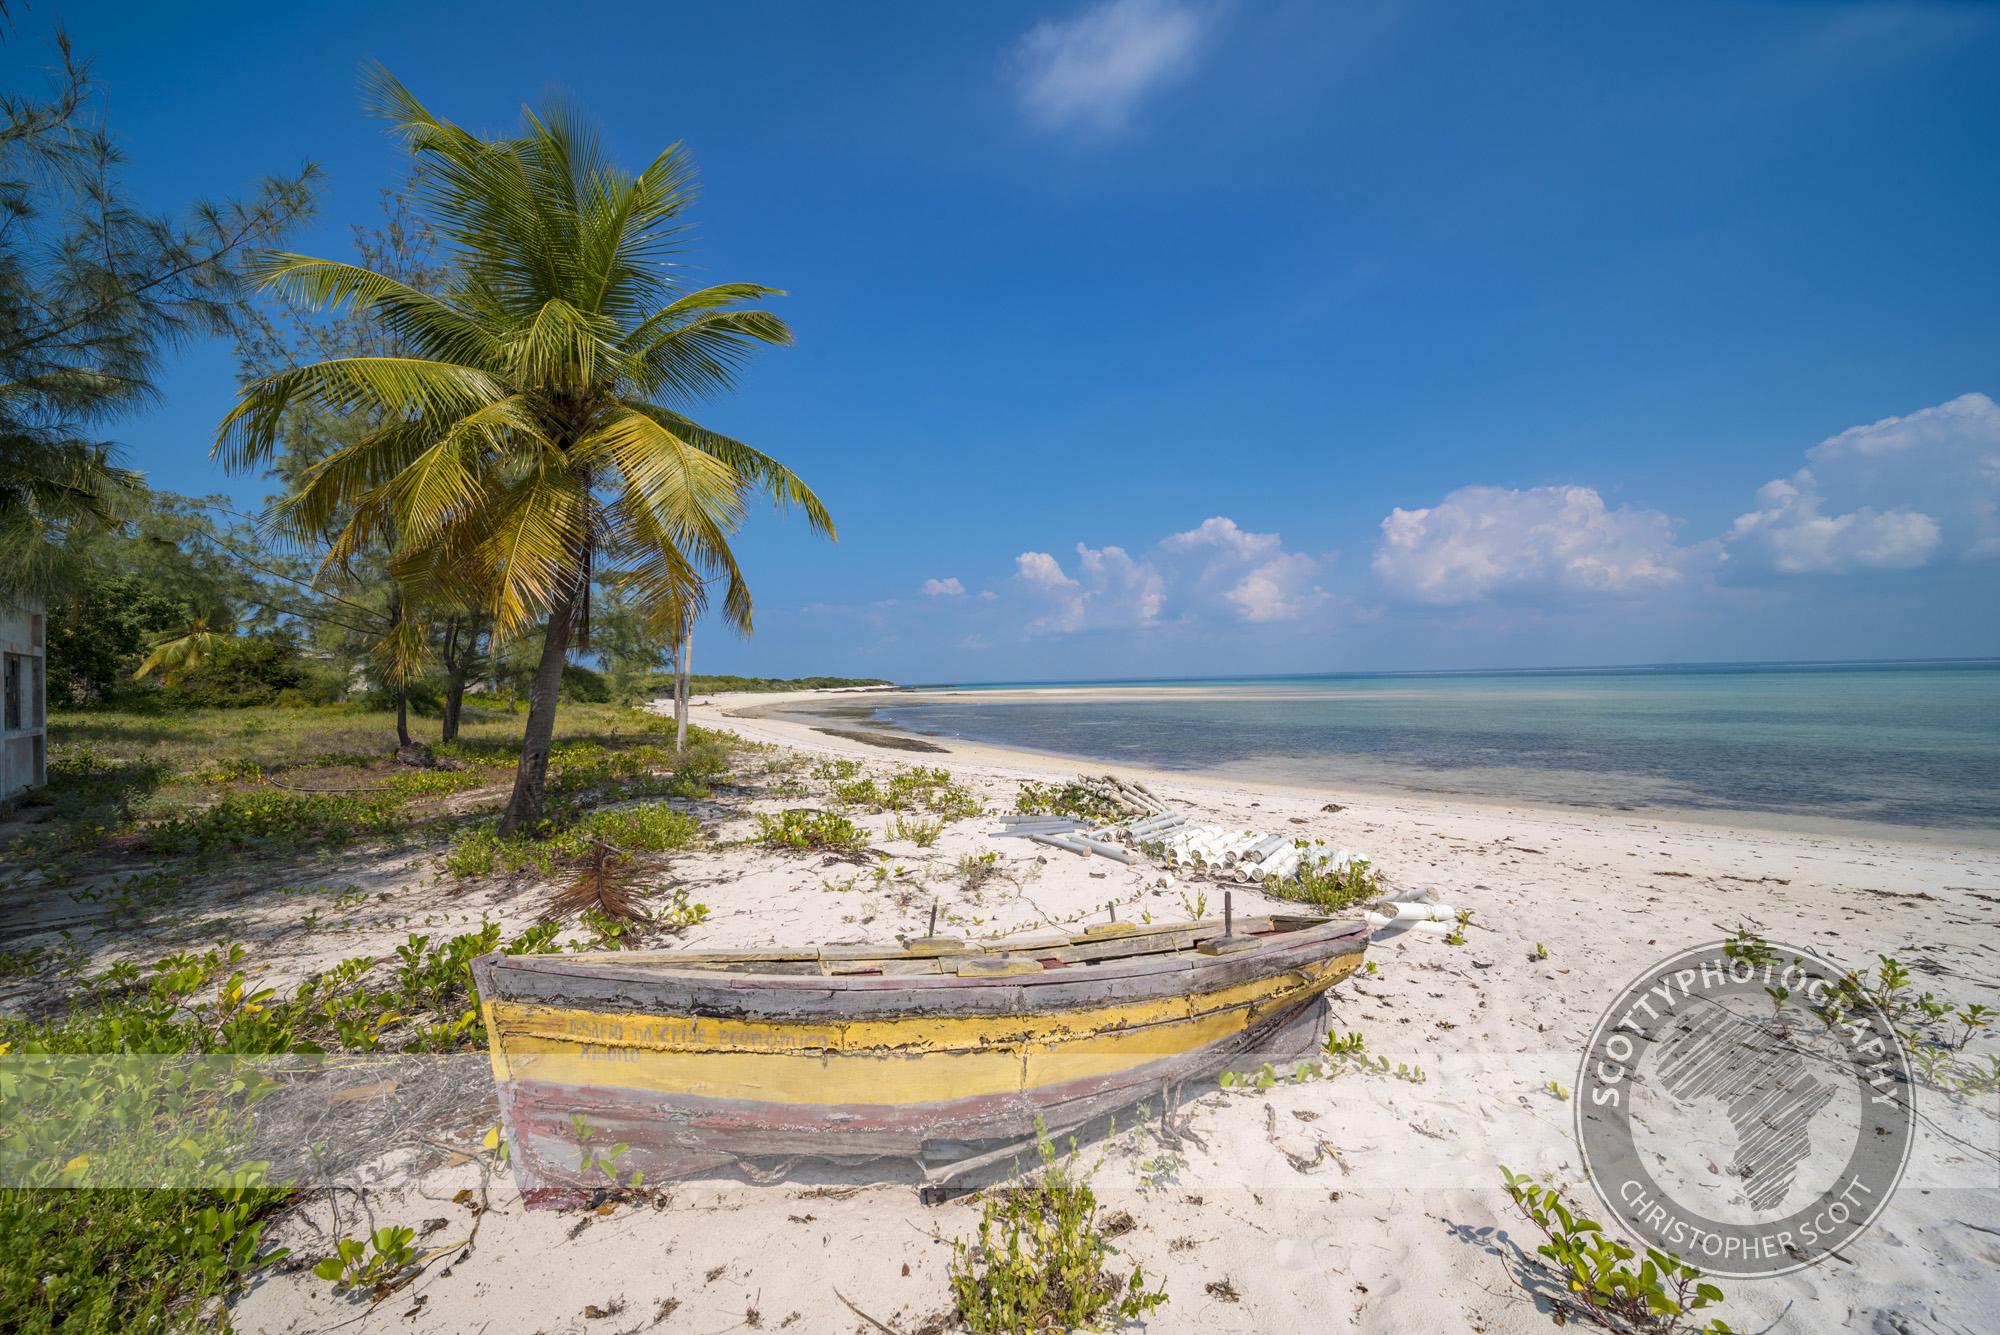 Mozambique-1651.jpg